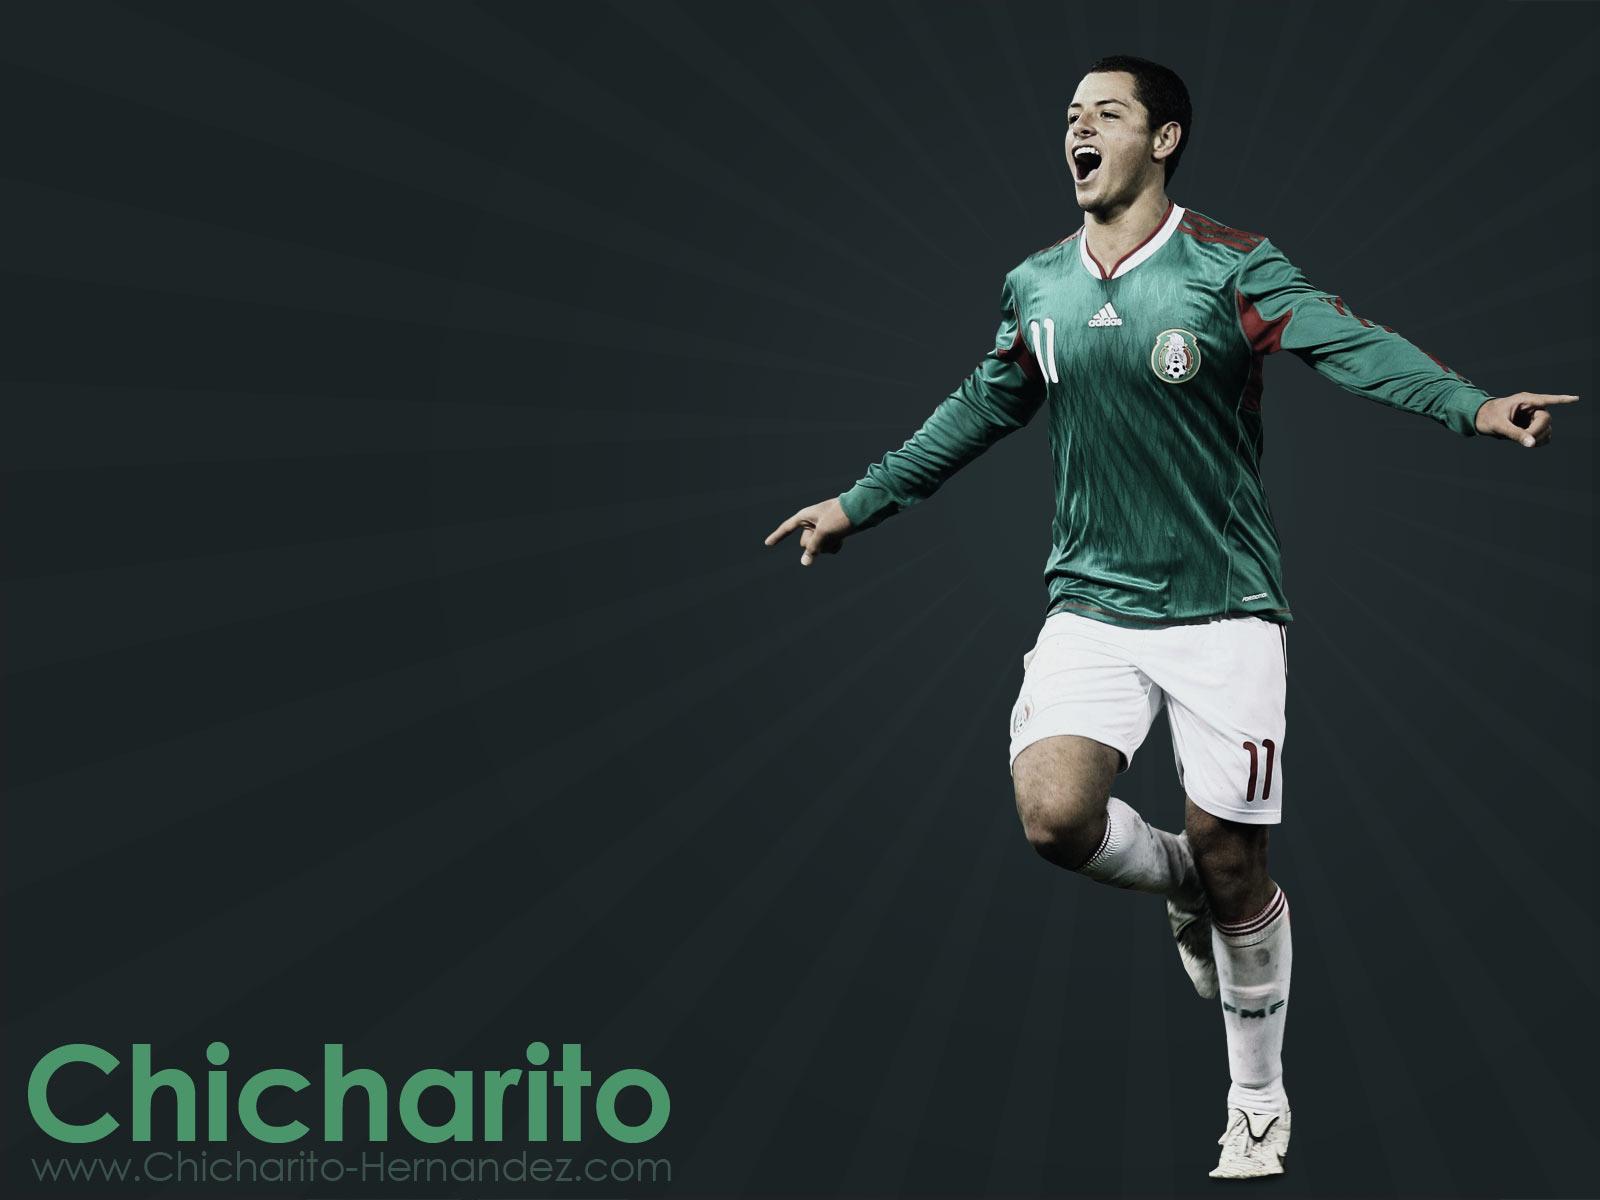 http://4.bp.blogspot.com/-ZLtVHiQjaZ4/TeAwR3OhjNI/AAAAAAAACpQ/rYOSAaY4hAk/s1600/chicharito-hernandez-wallpaper-01-1600x1200.jpg